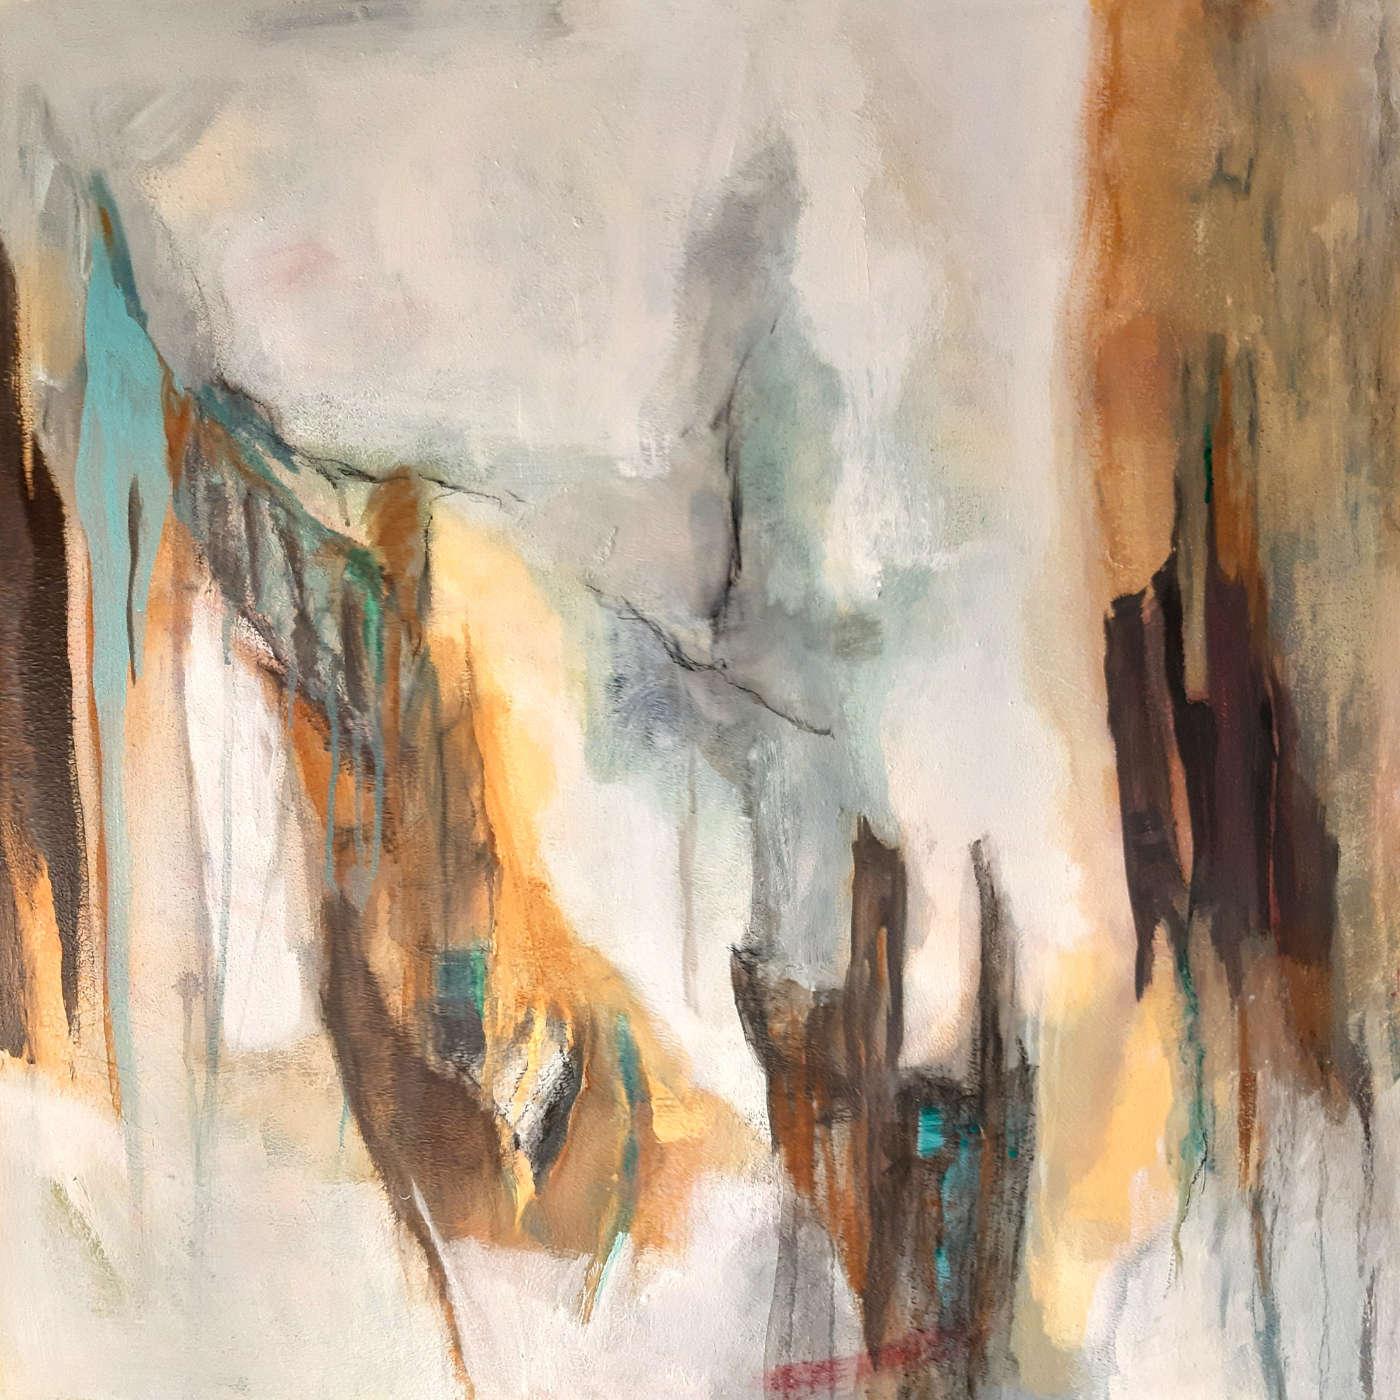 Morsch - Acryl, mixed media auf Leinwand, 80 x 80 cm